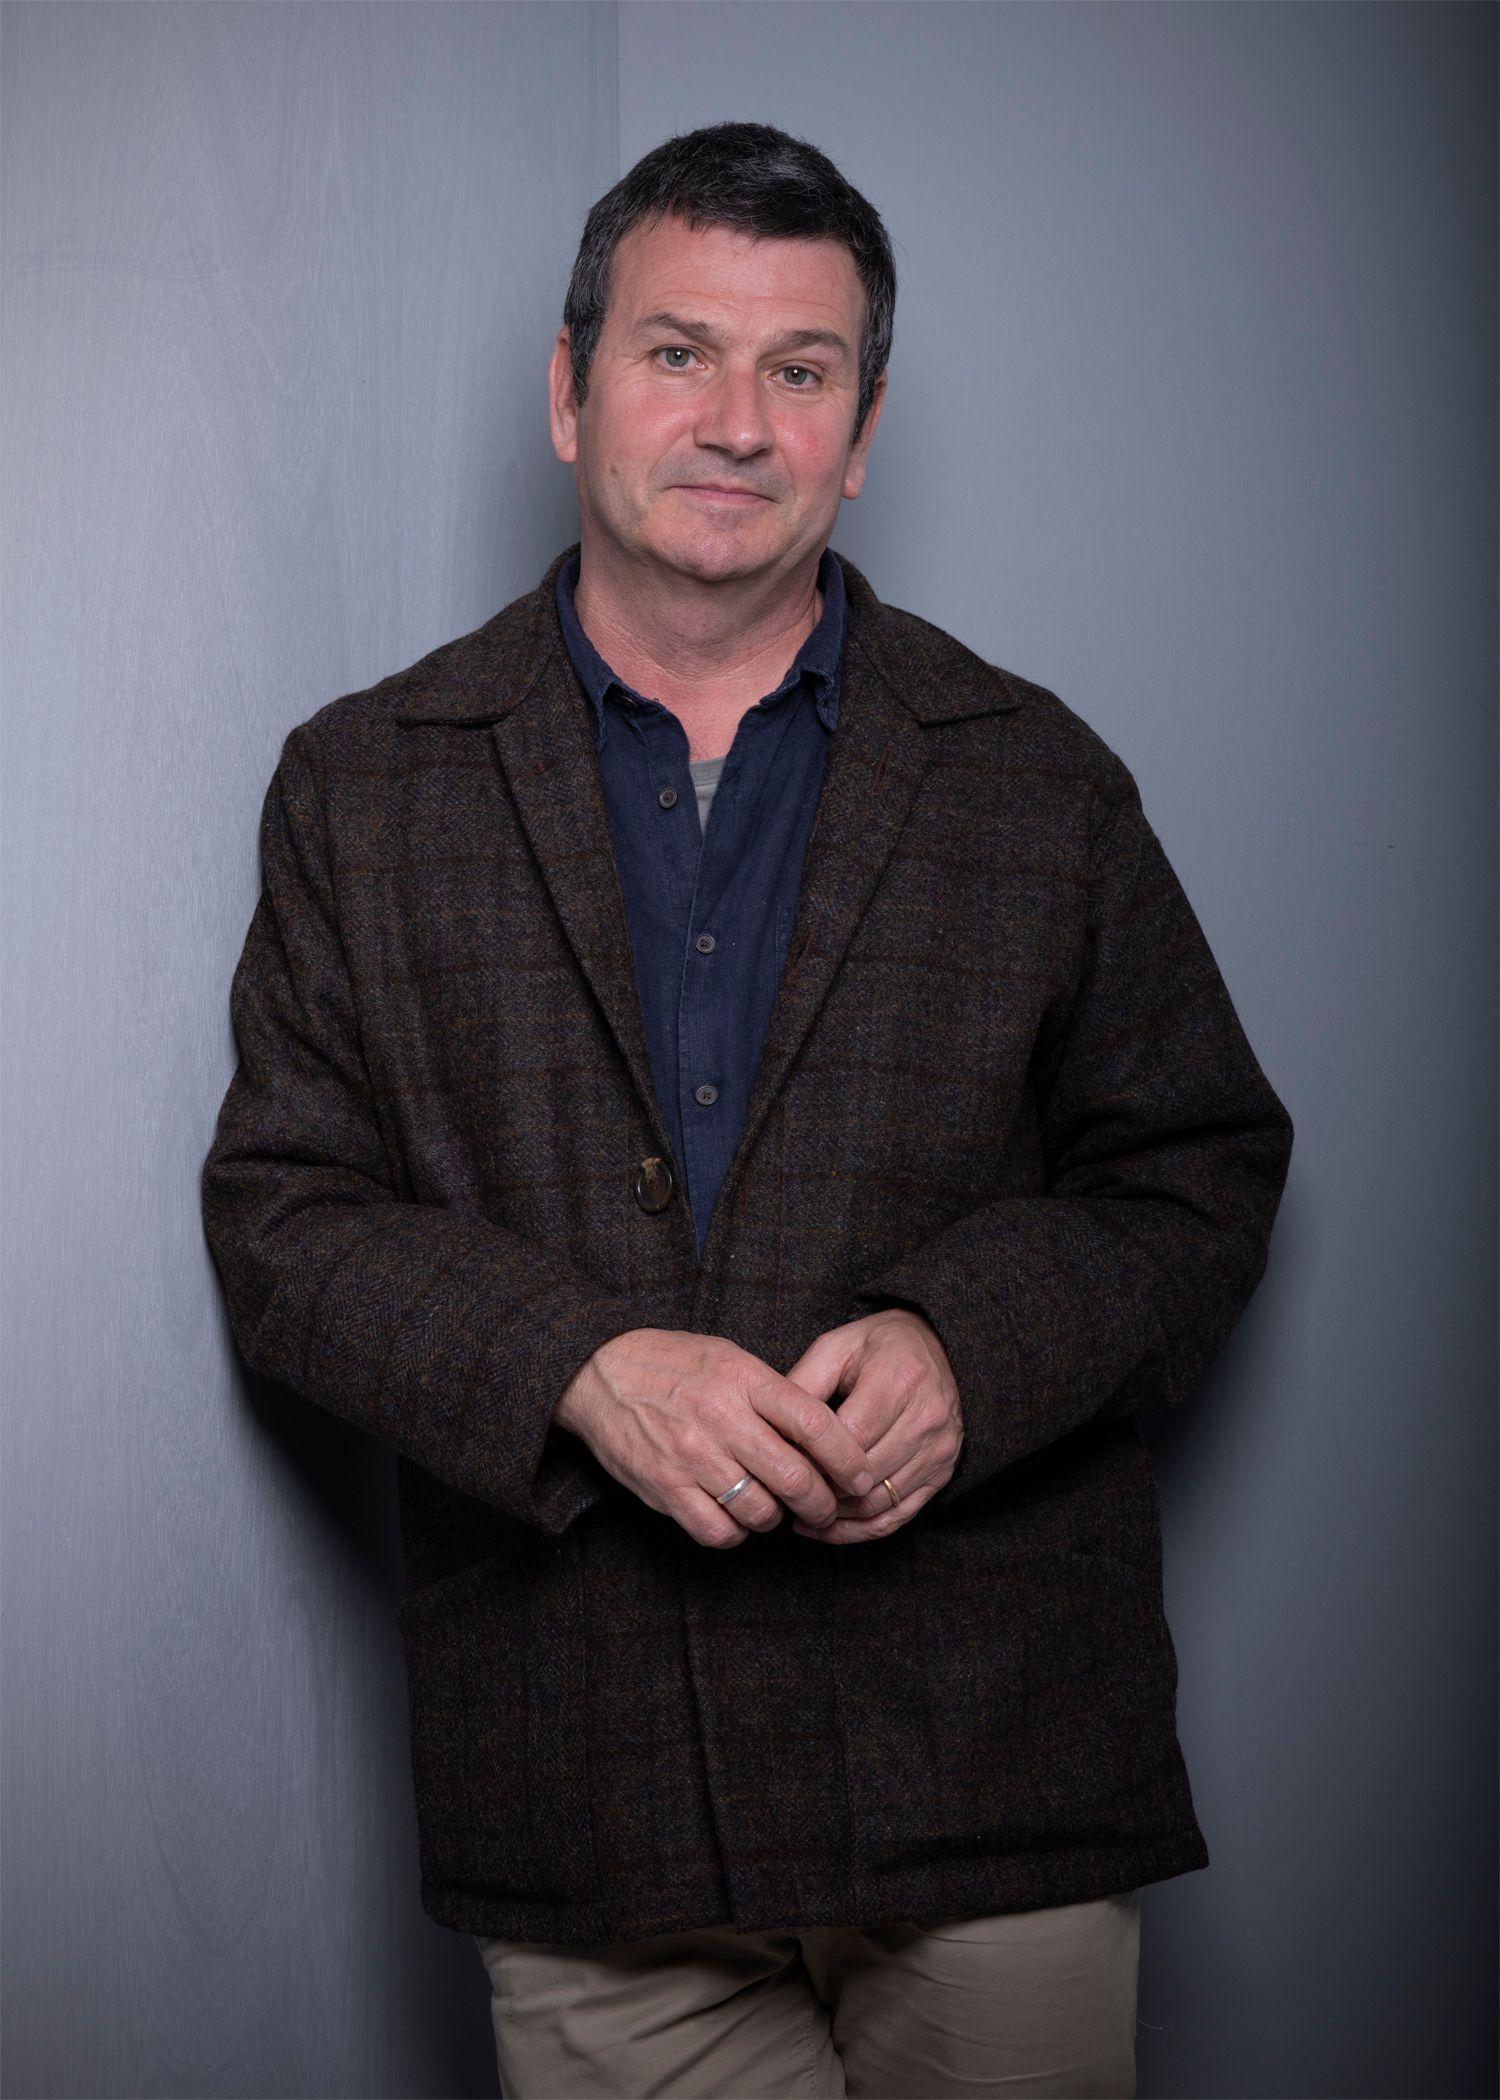 Mark Cocker